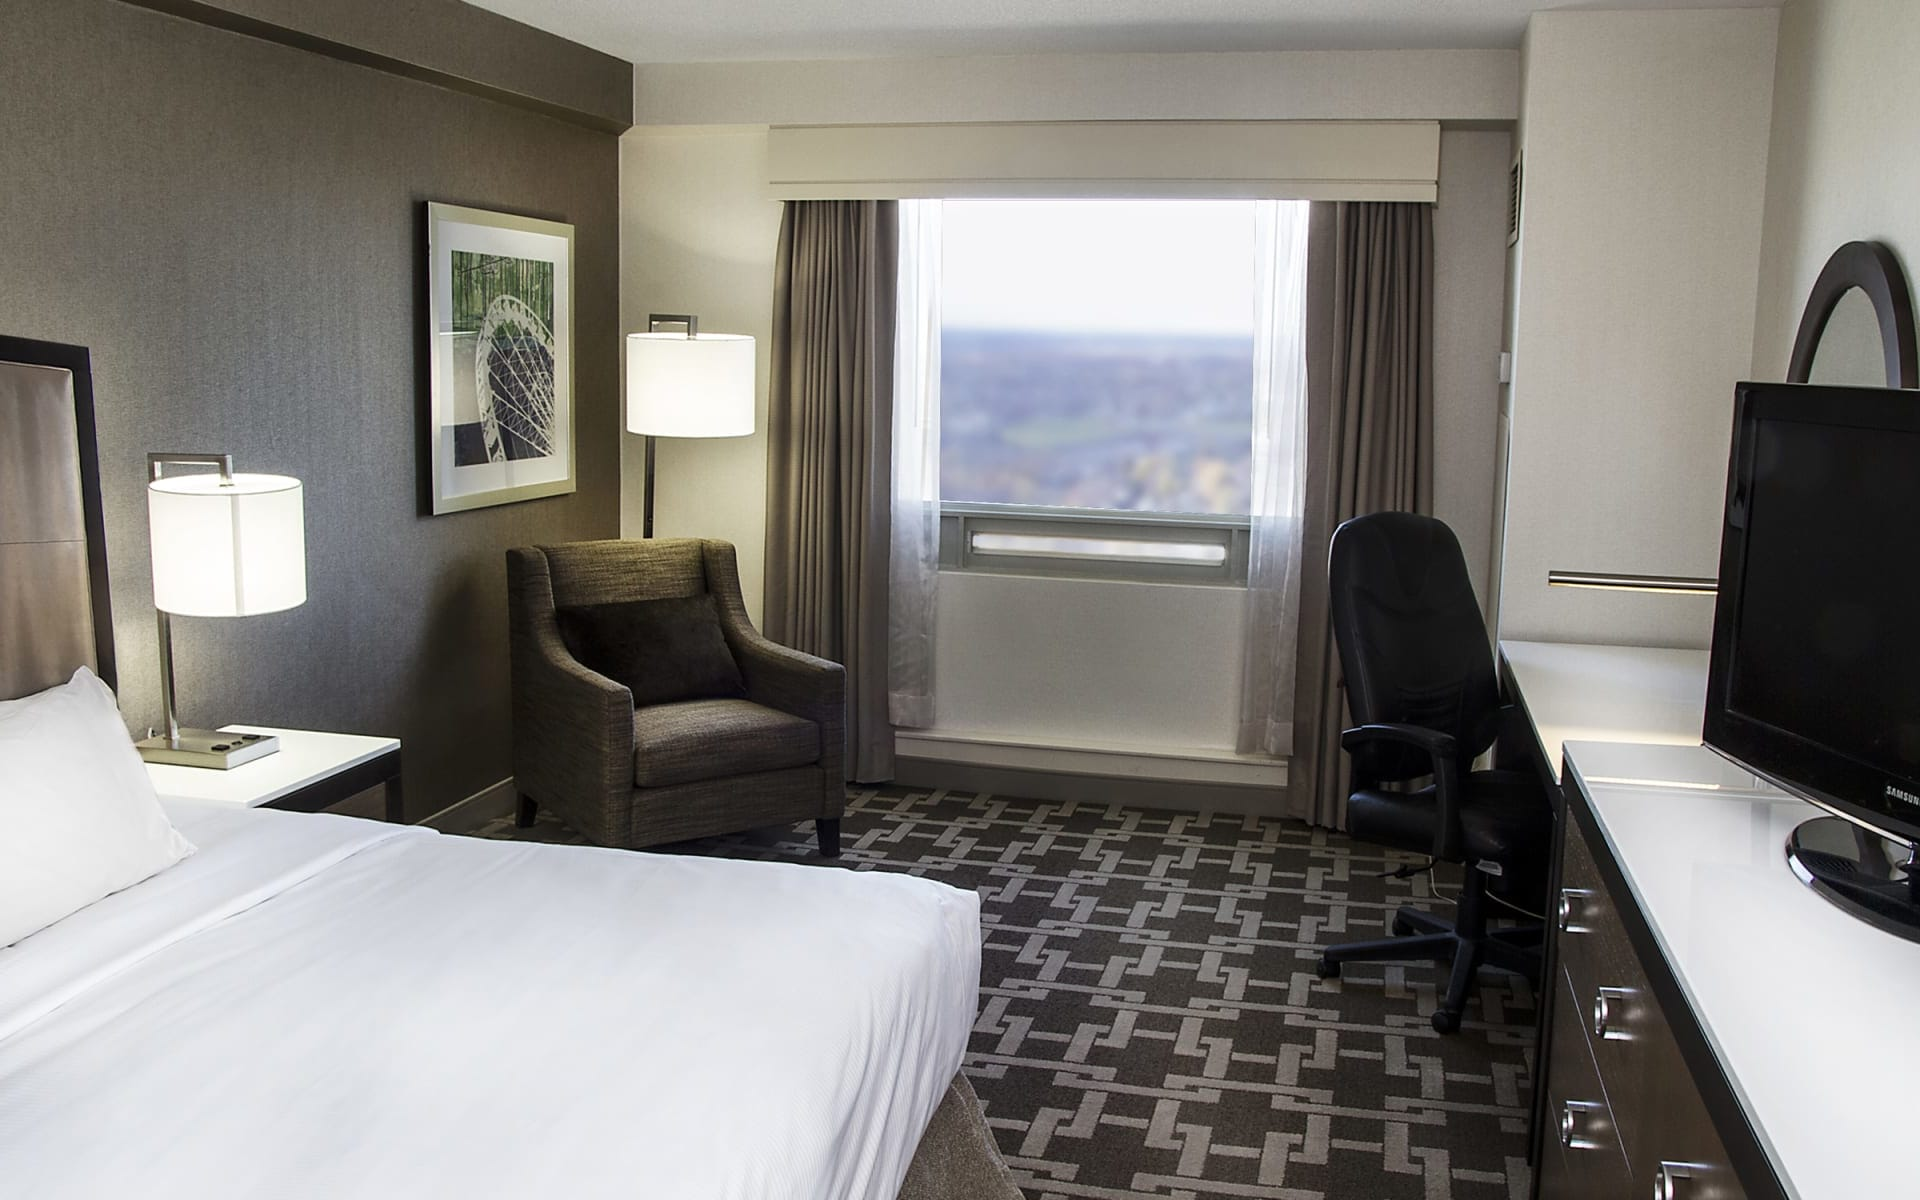 Hilton Hotel & Suites Fallsview in Niagara Falls: zimmer_Hilton Hotel & Suites Fallsview_CityviewRoomKingBed